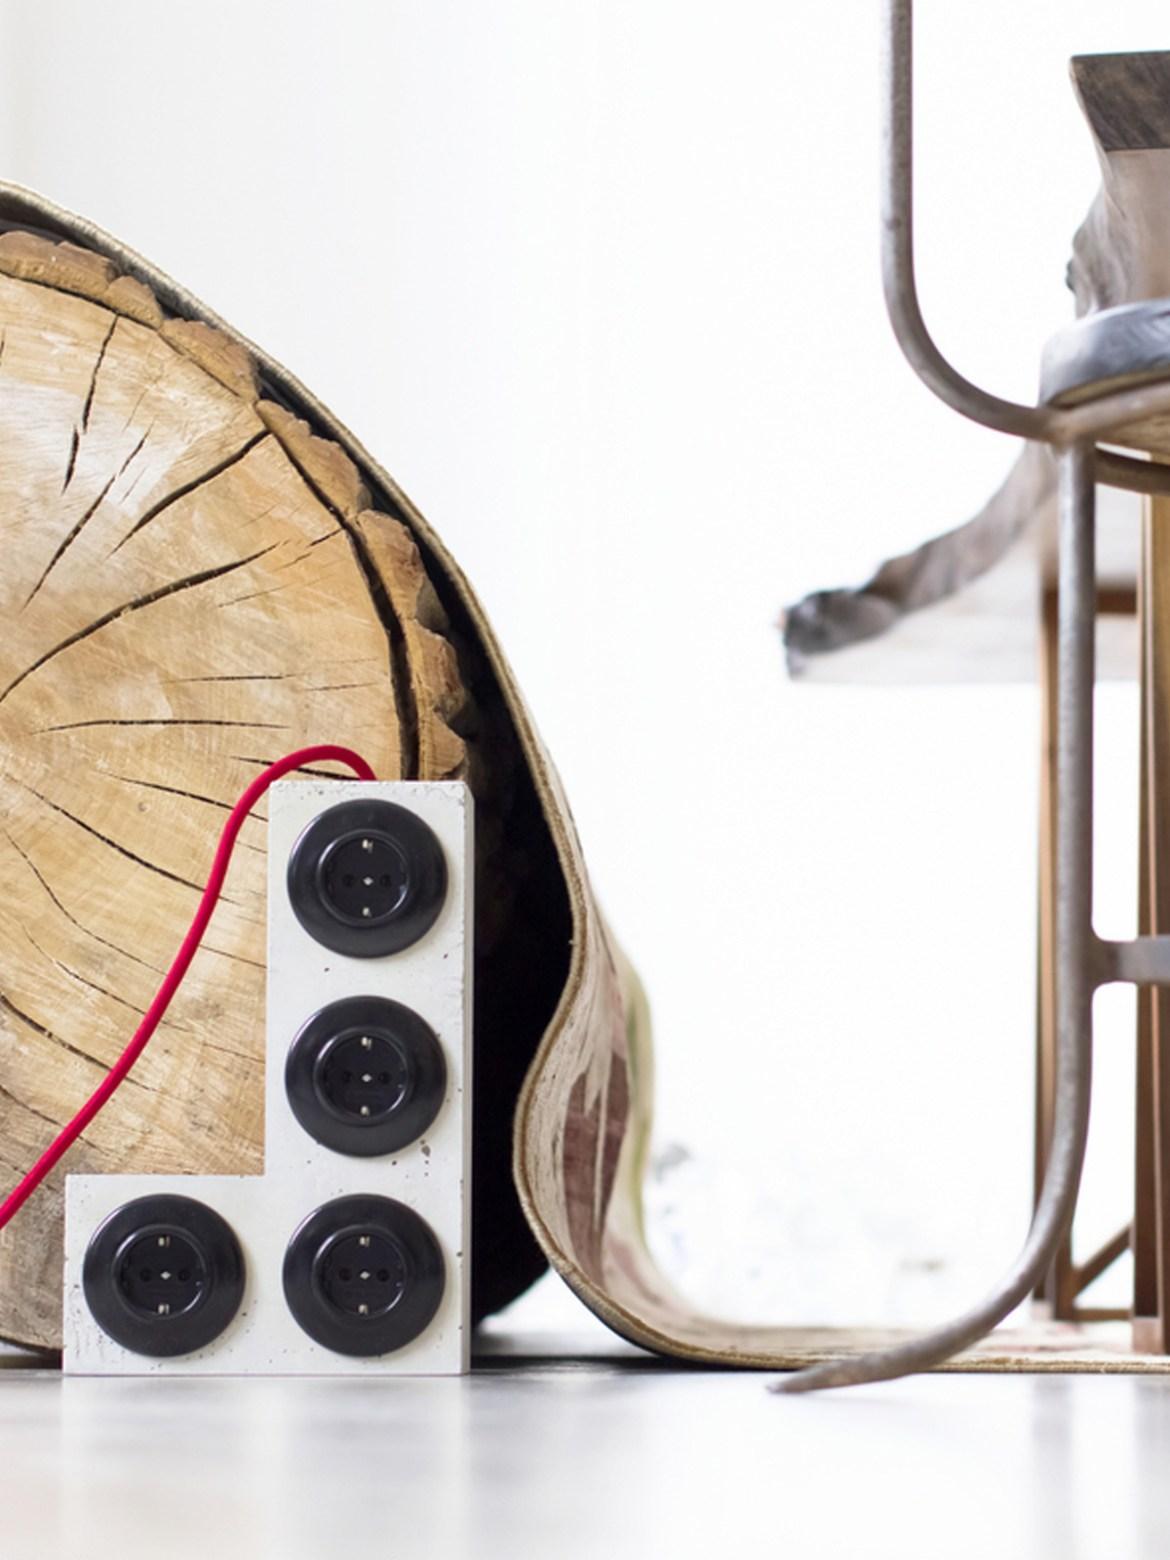 DesignOrt Blog: Design aus Berlin L Tetri Plug onkto Beton